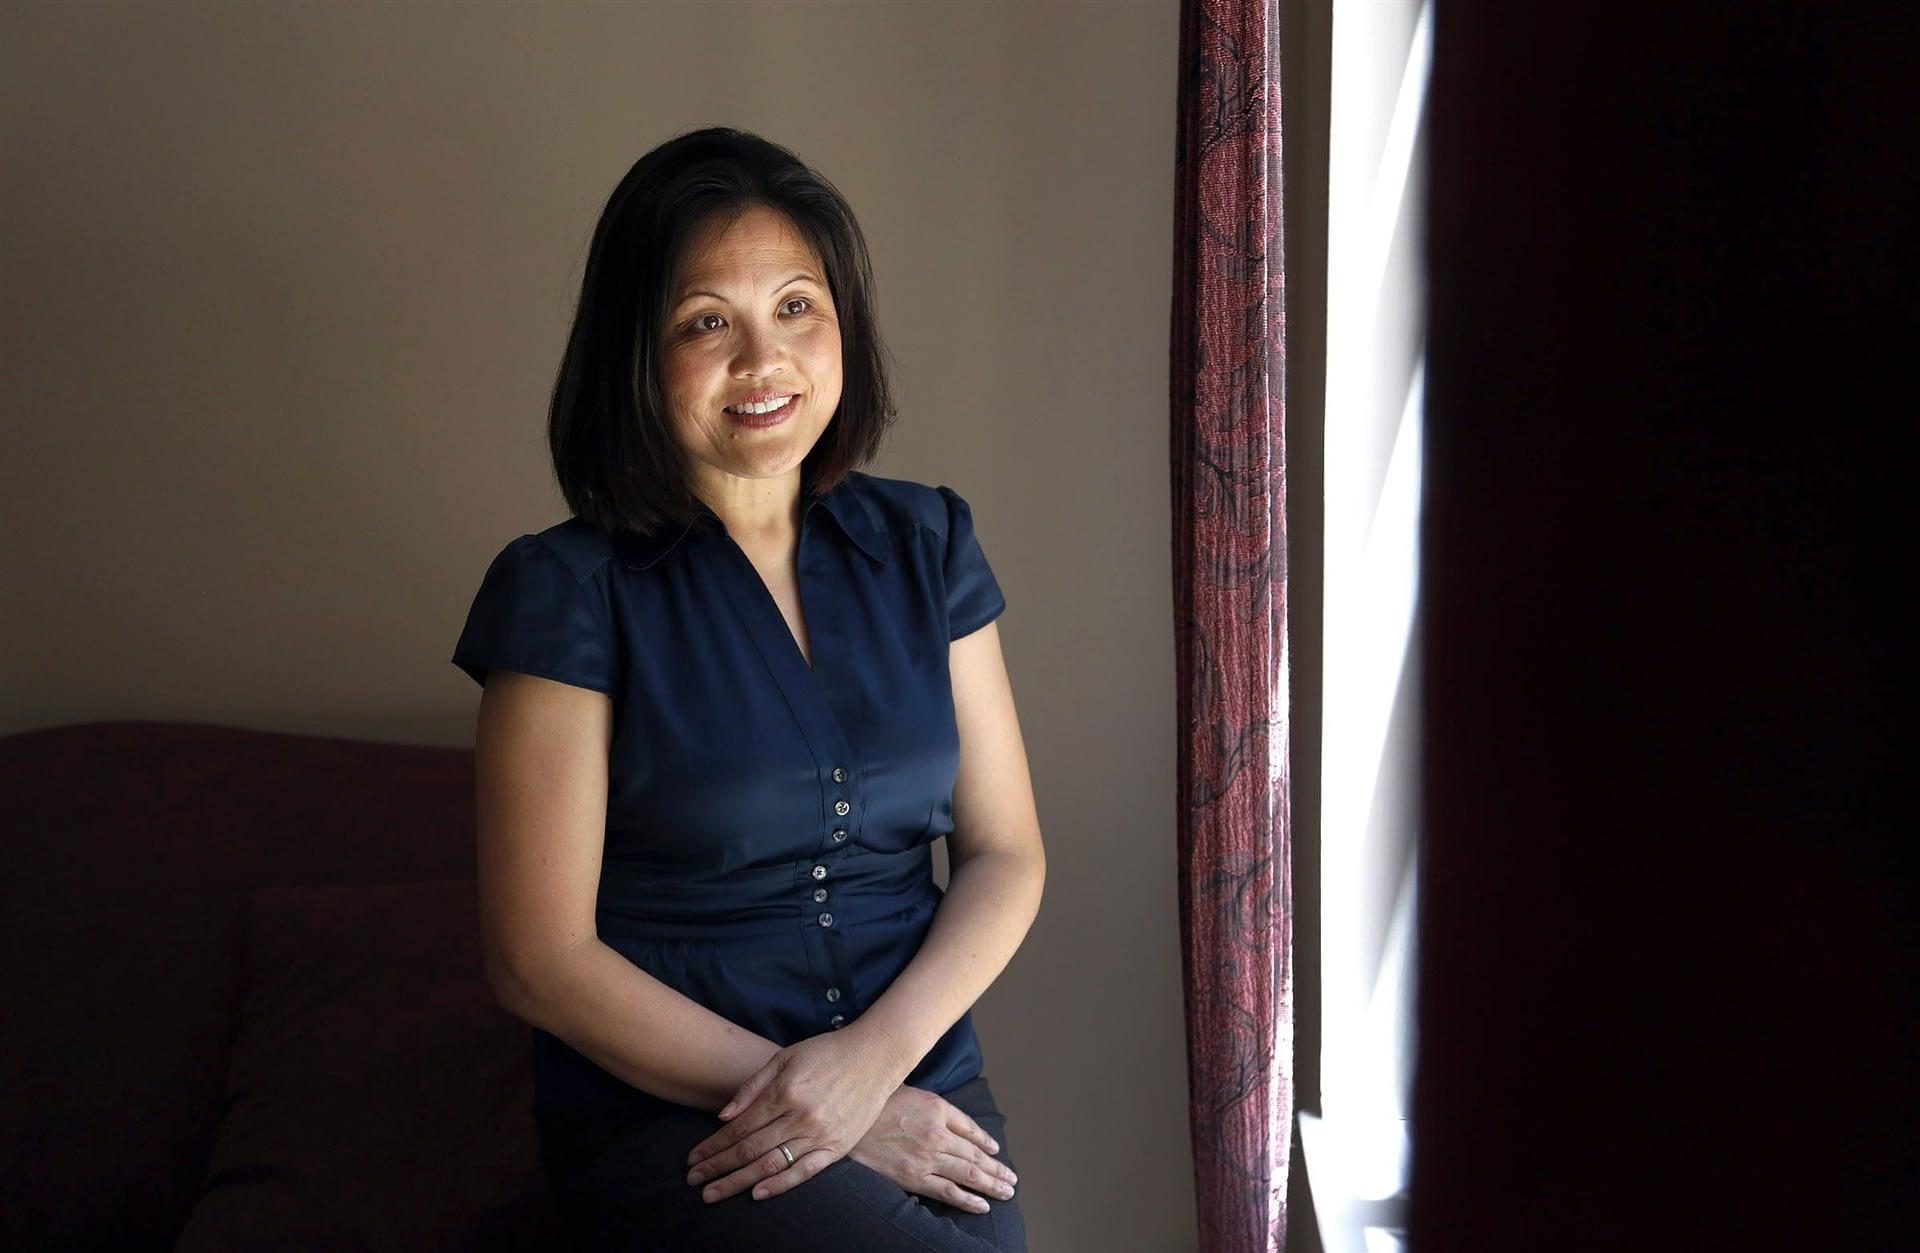 Deputy Secretary Julie Su smiling in photograph